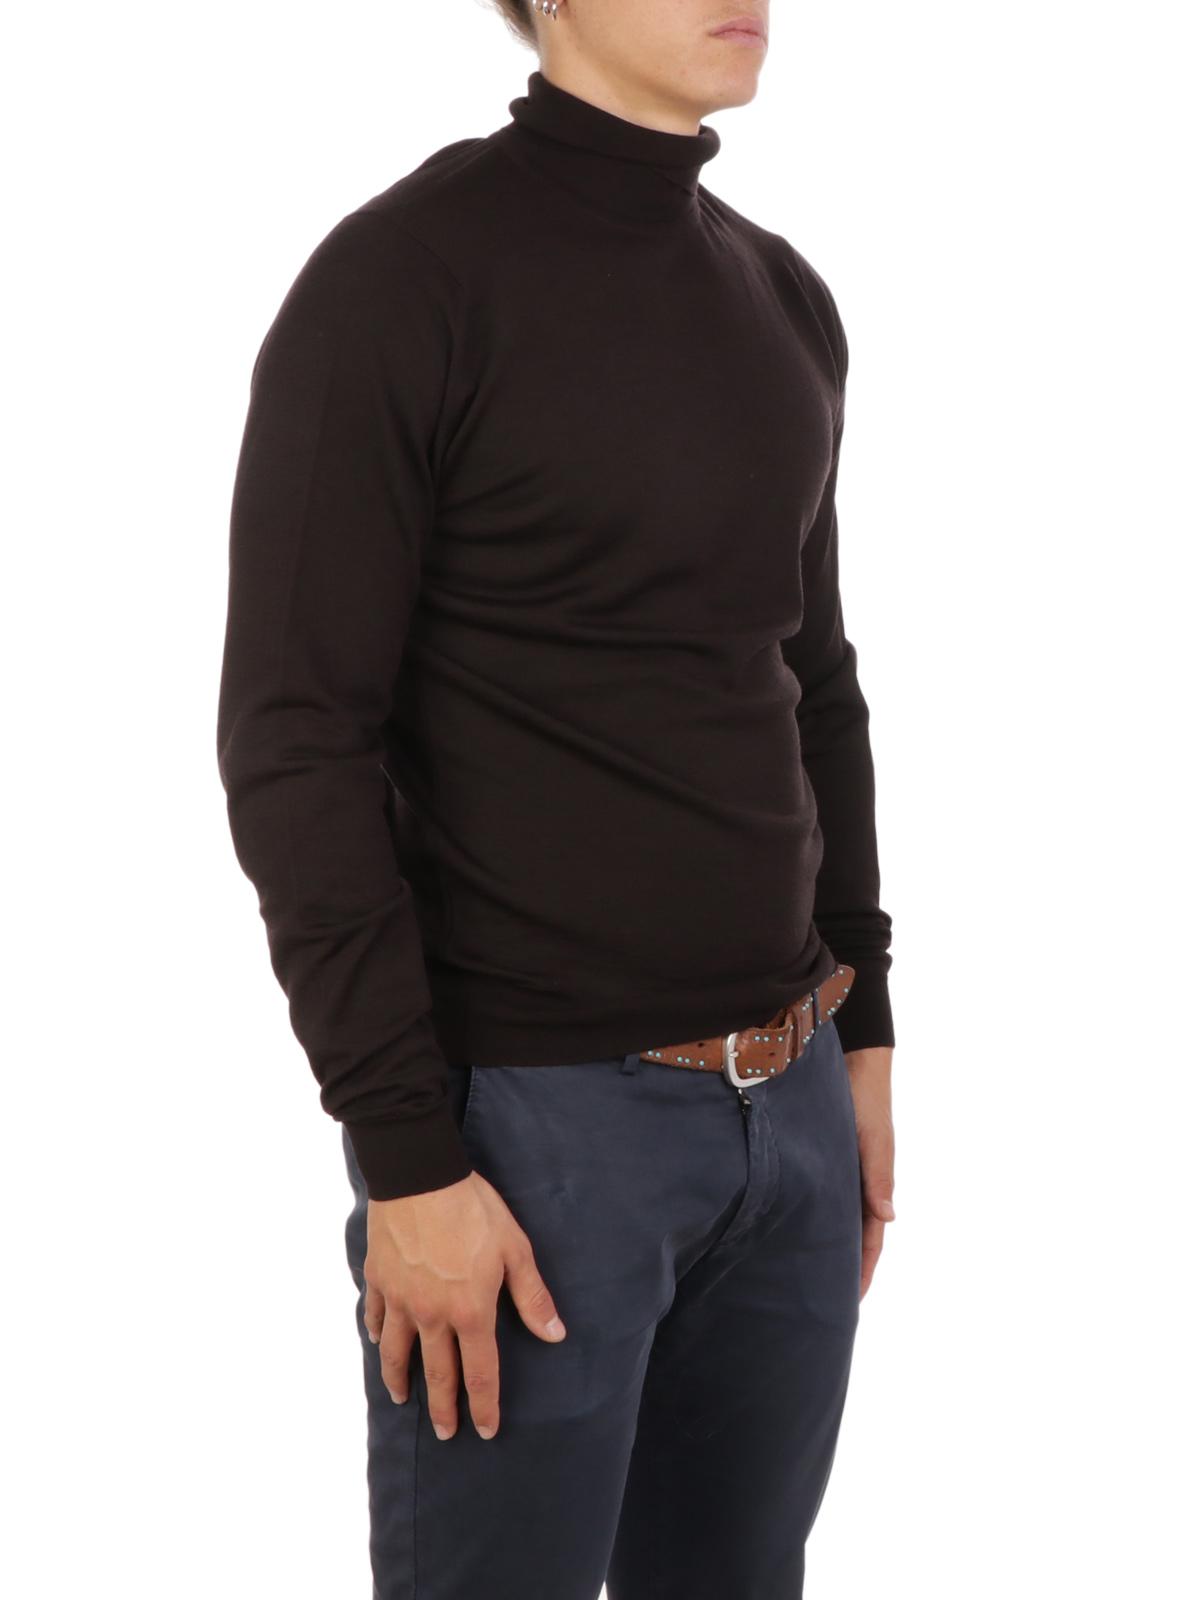 Picture of JOHN SMEDLEY | Men's Cherwell Turtleneck Sweater